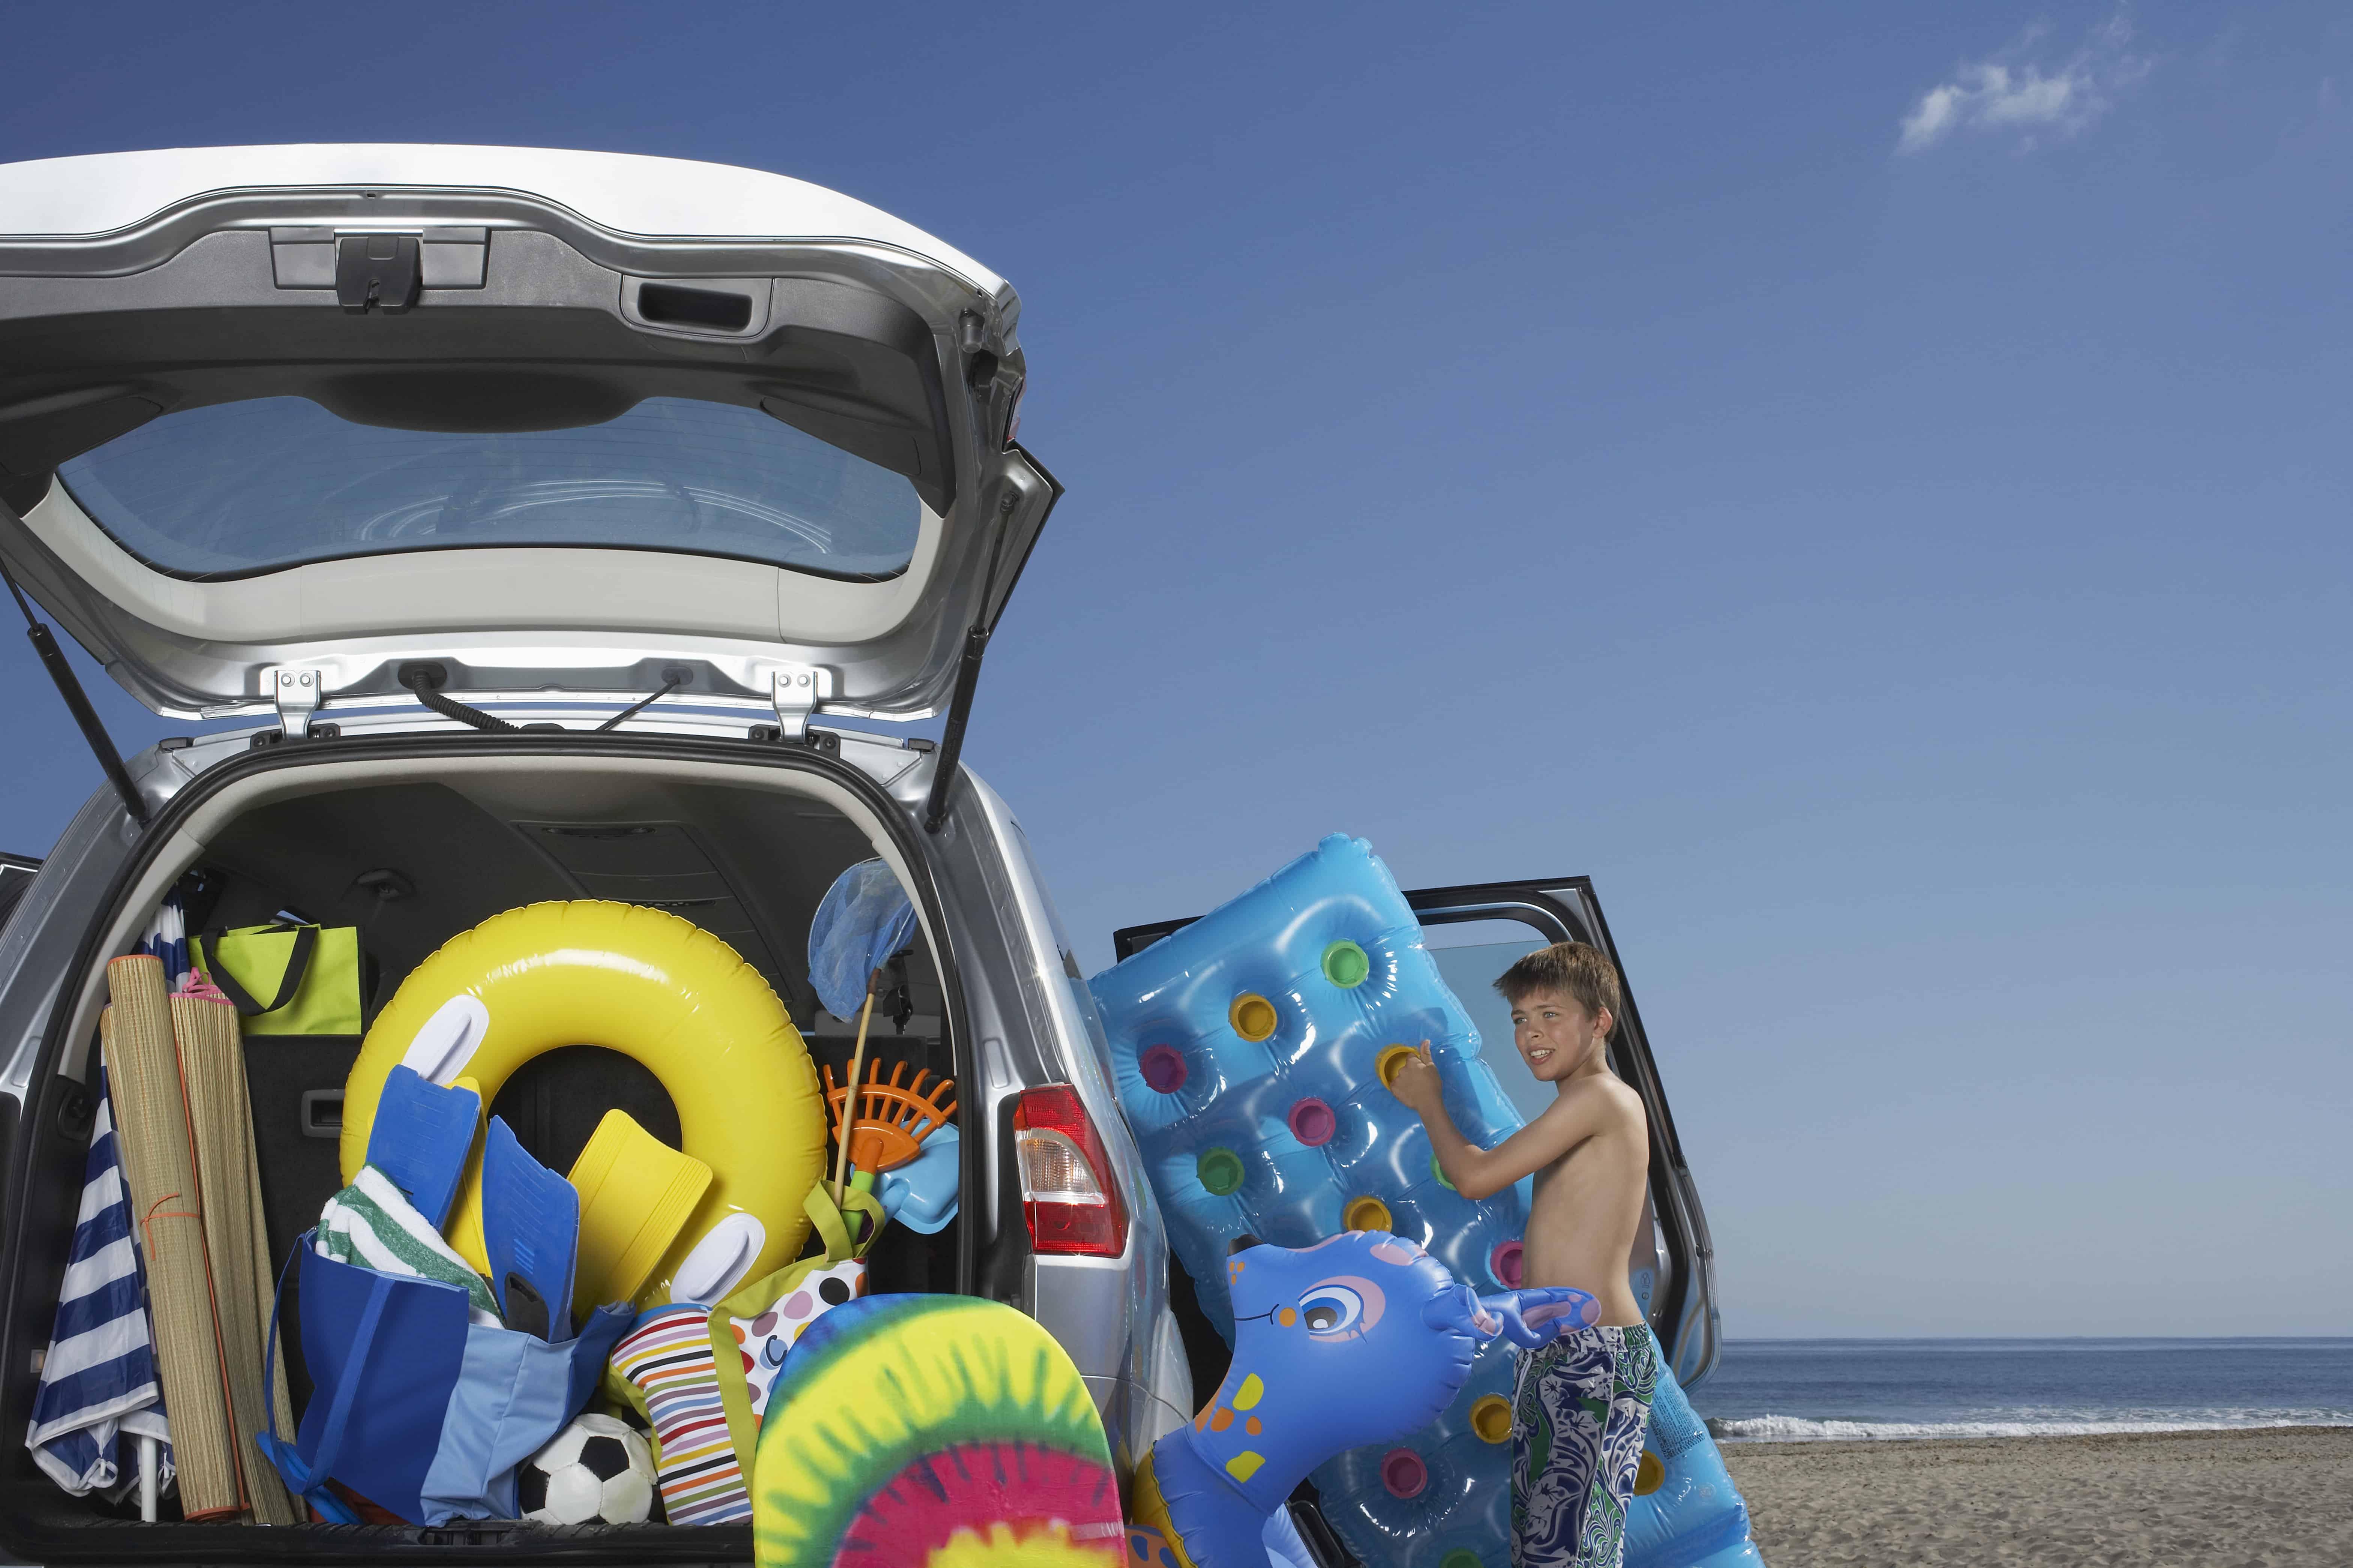 Boy (10-12) unloading air mattress from car full of beach accessories for summer organization